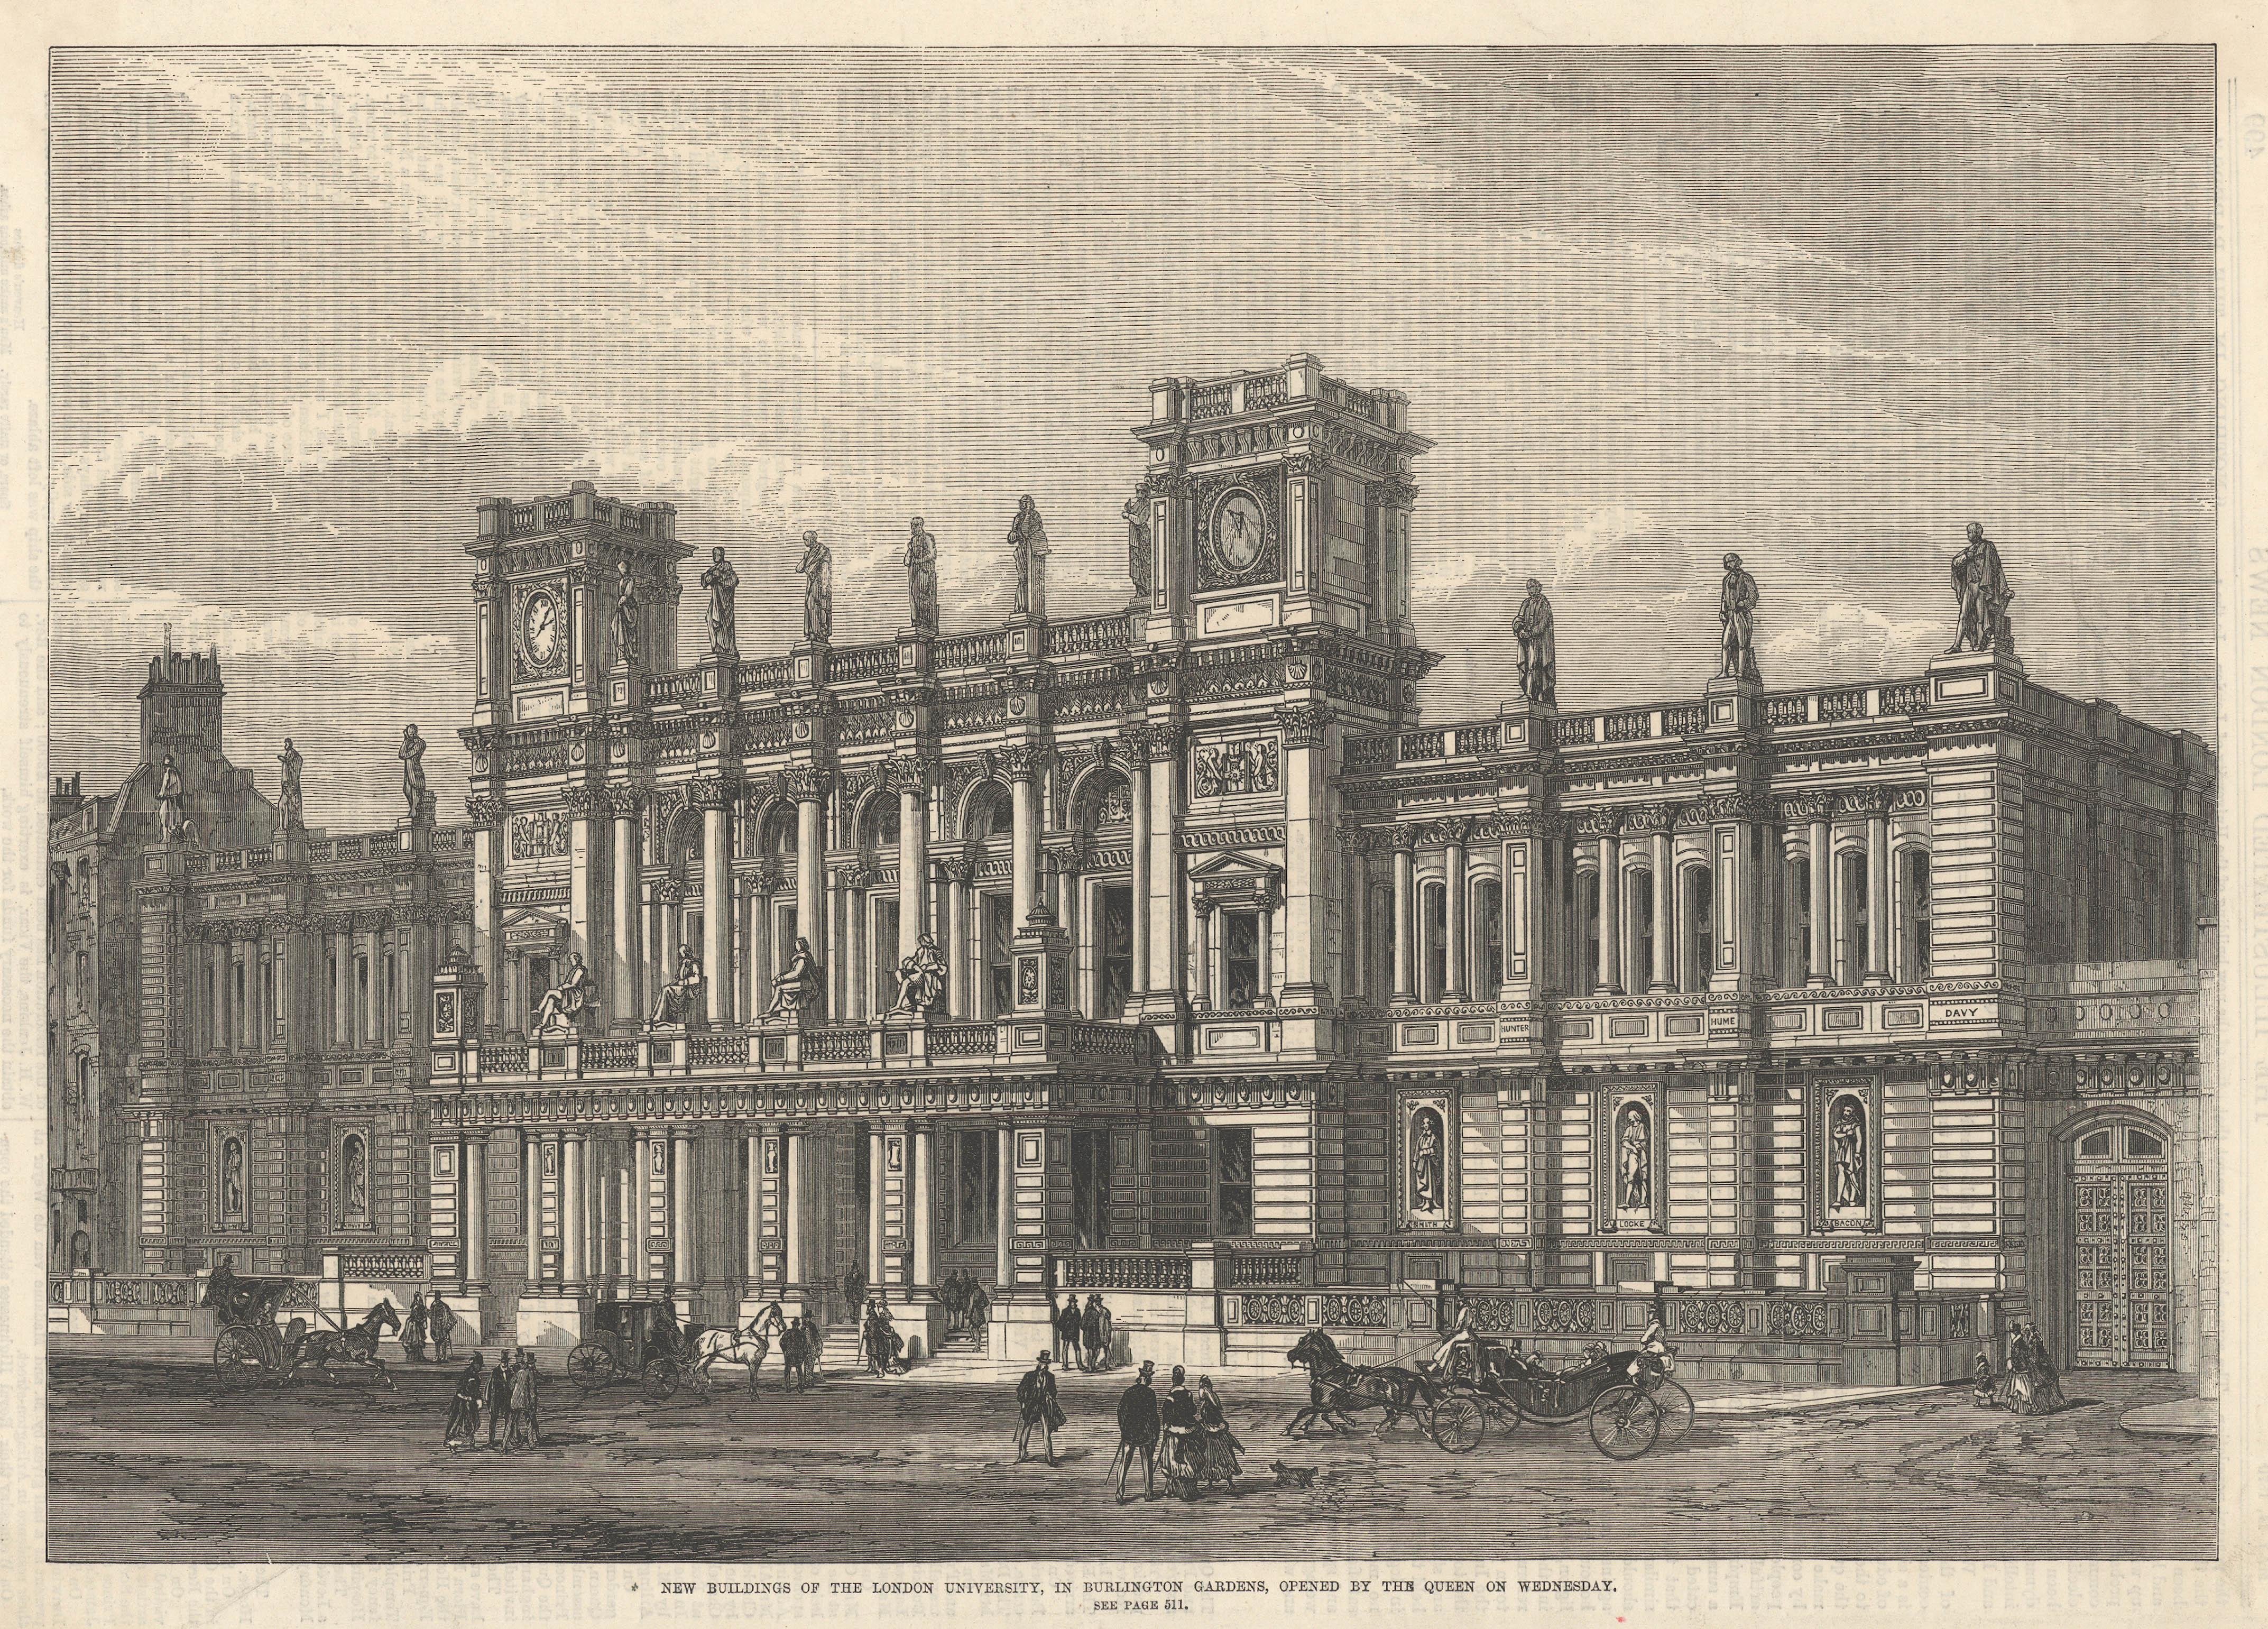 New Buildings of the London University, Burlington Gardens, 1870